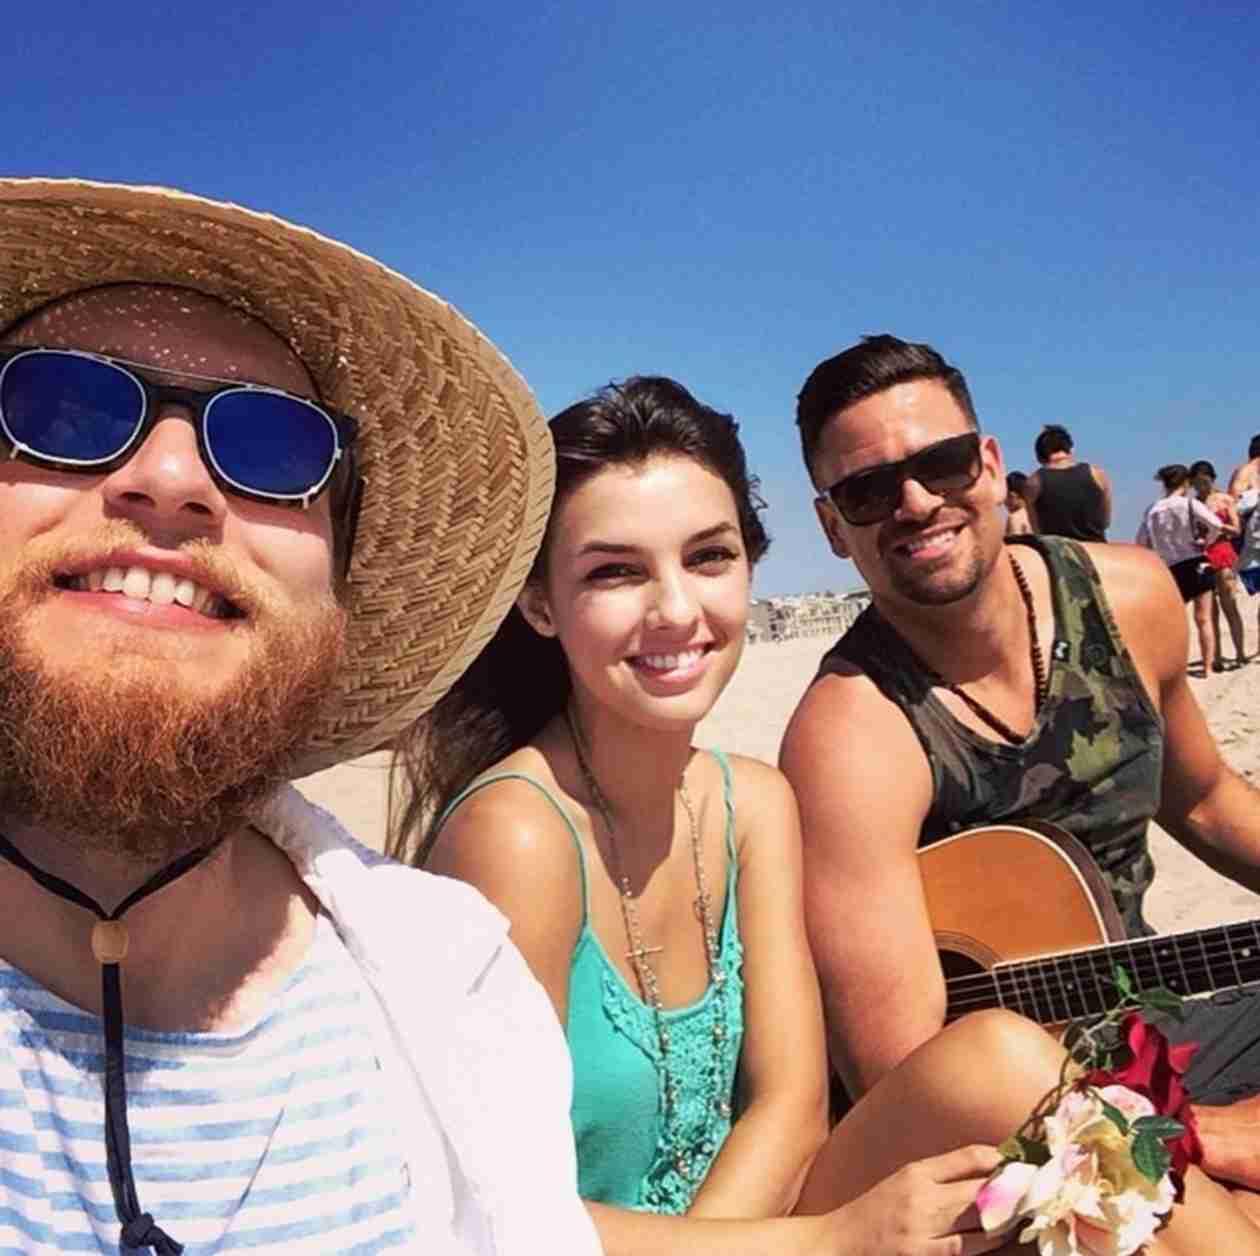 Mark Salling Dating 19-Year-Old Disney Star, Denyse Tontz